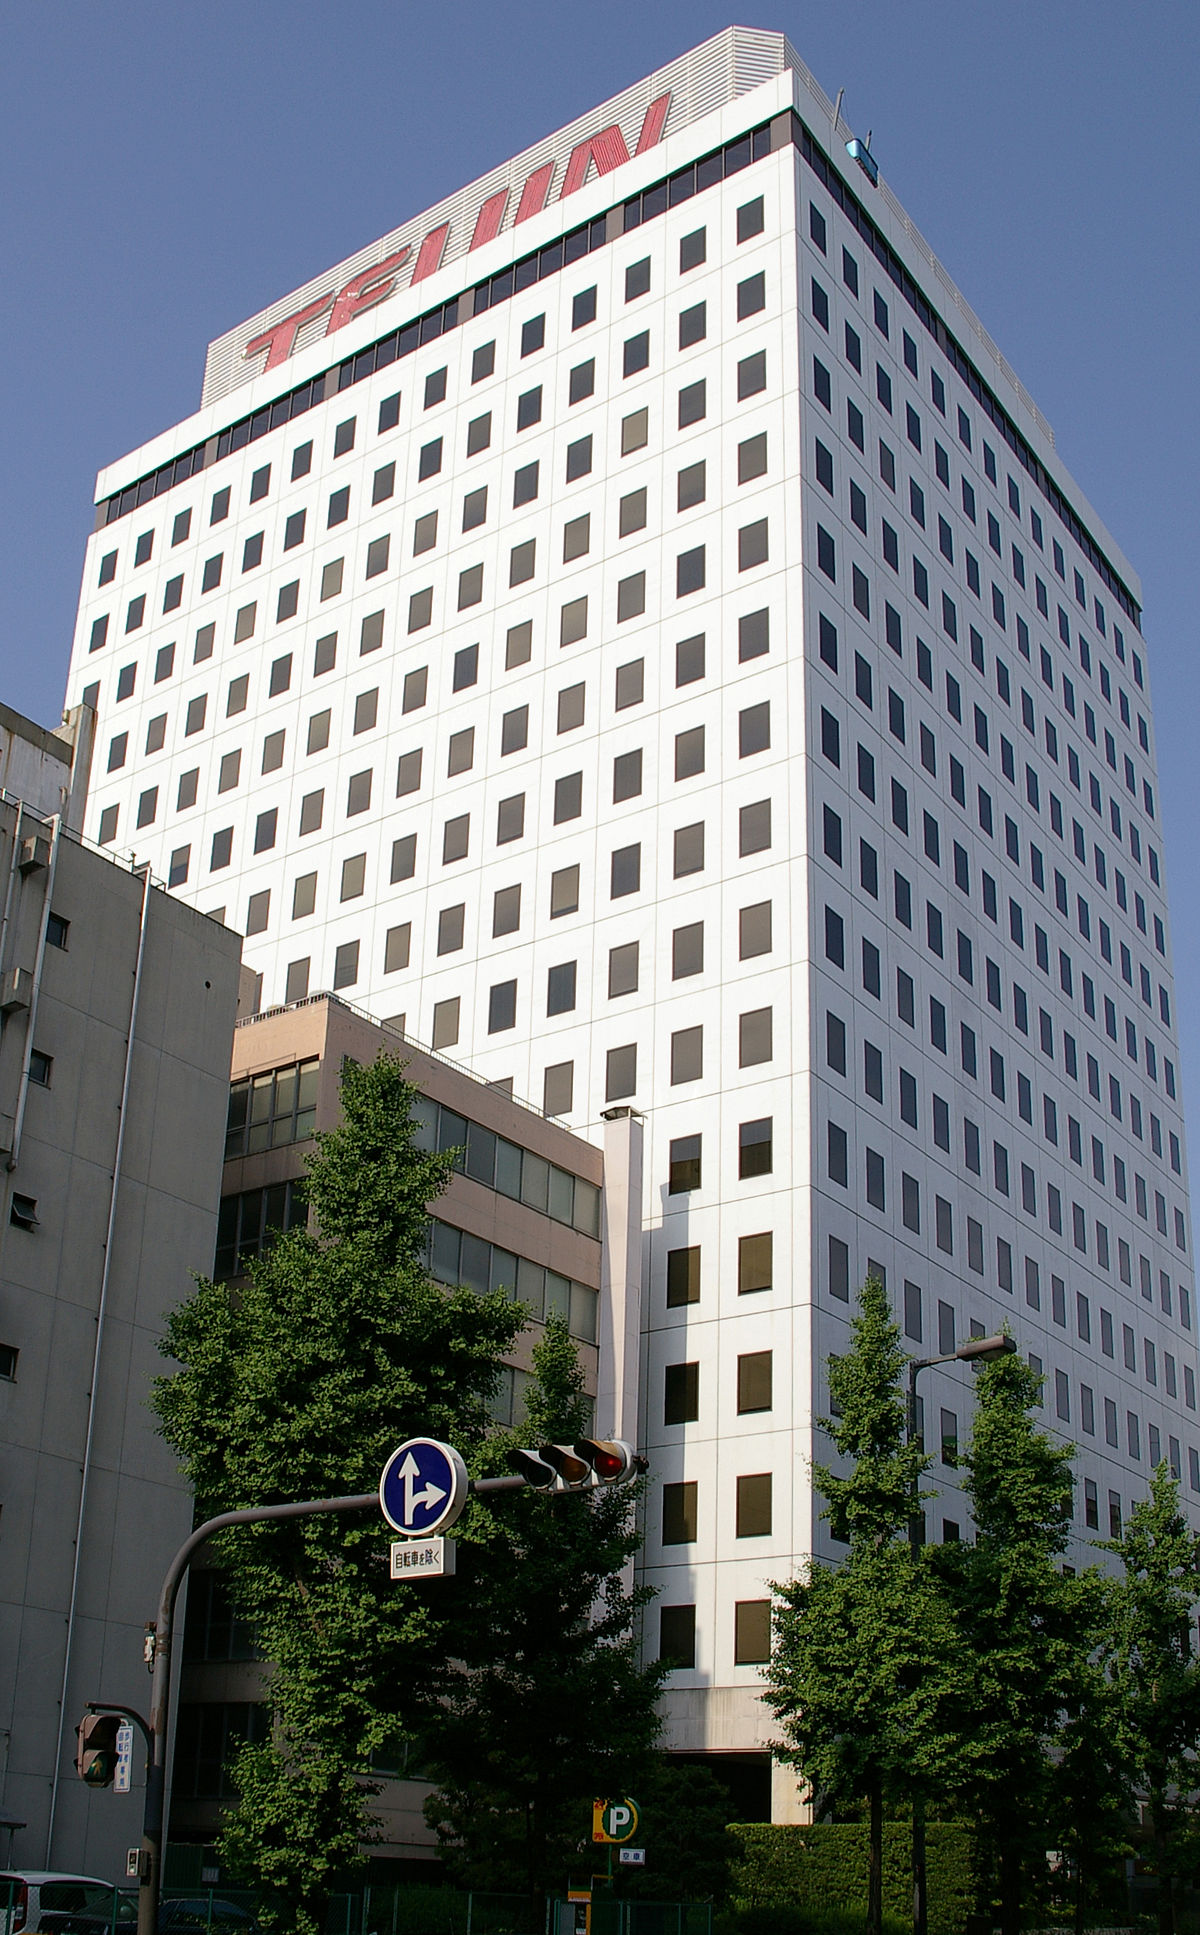 Teijin - Wikipedia